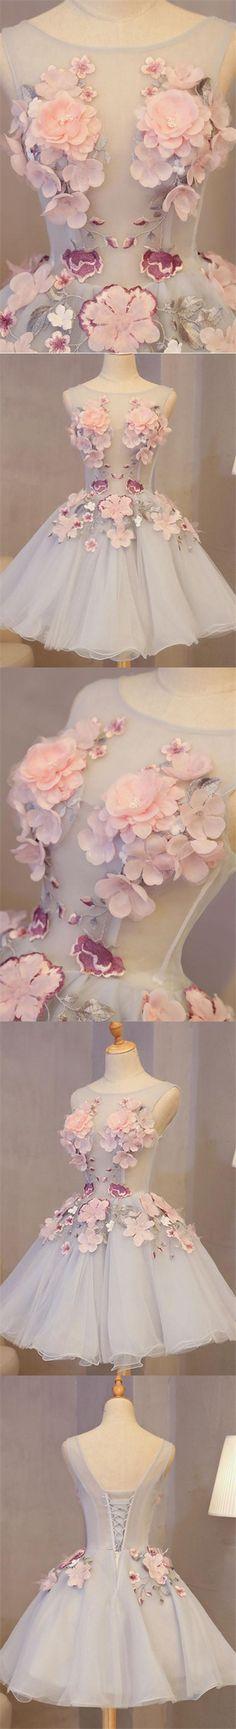 Chic Homecoming Dress Hand-Made Flower Organza Short Prom Dress Party Dress JK310